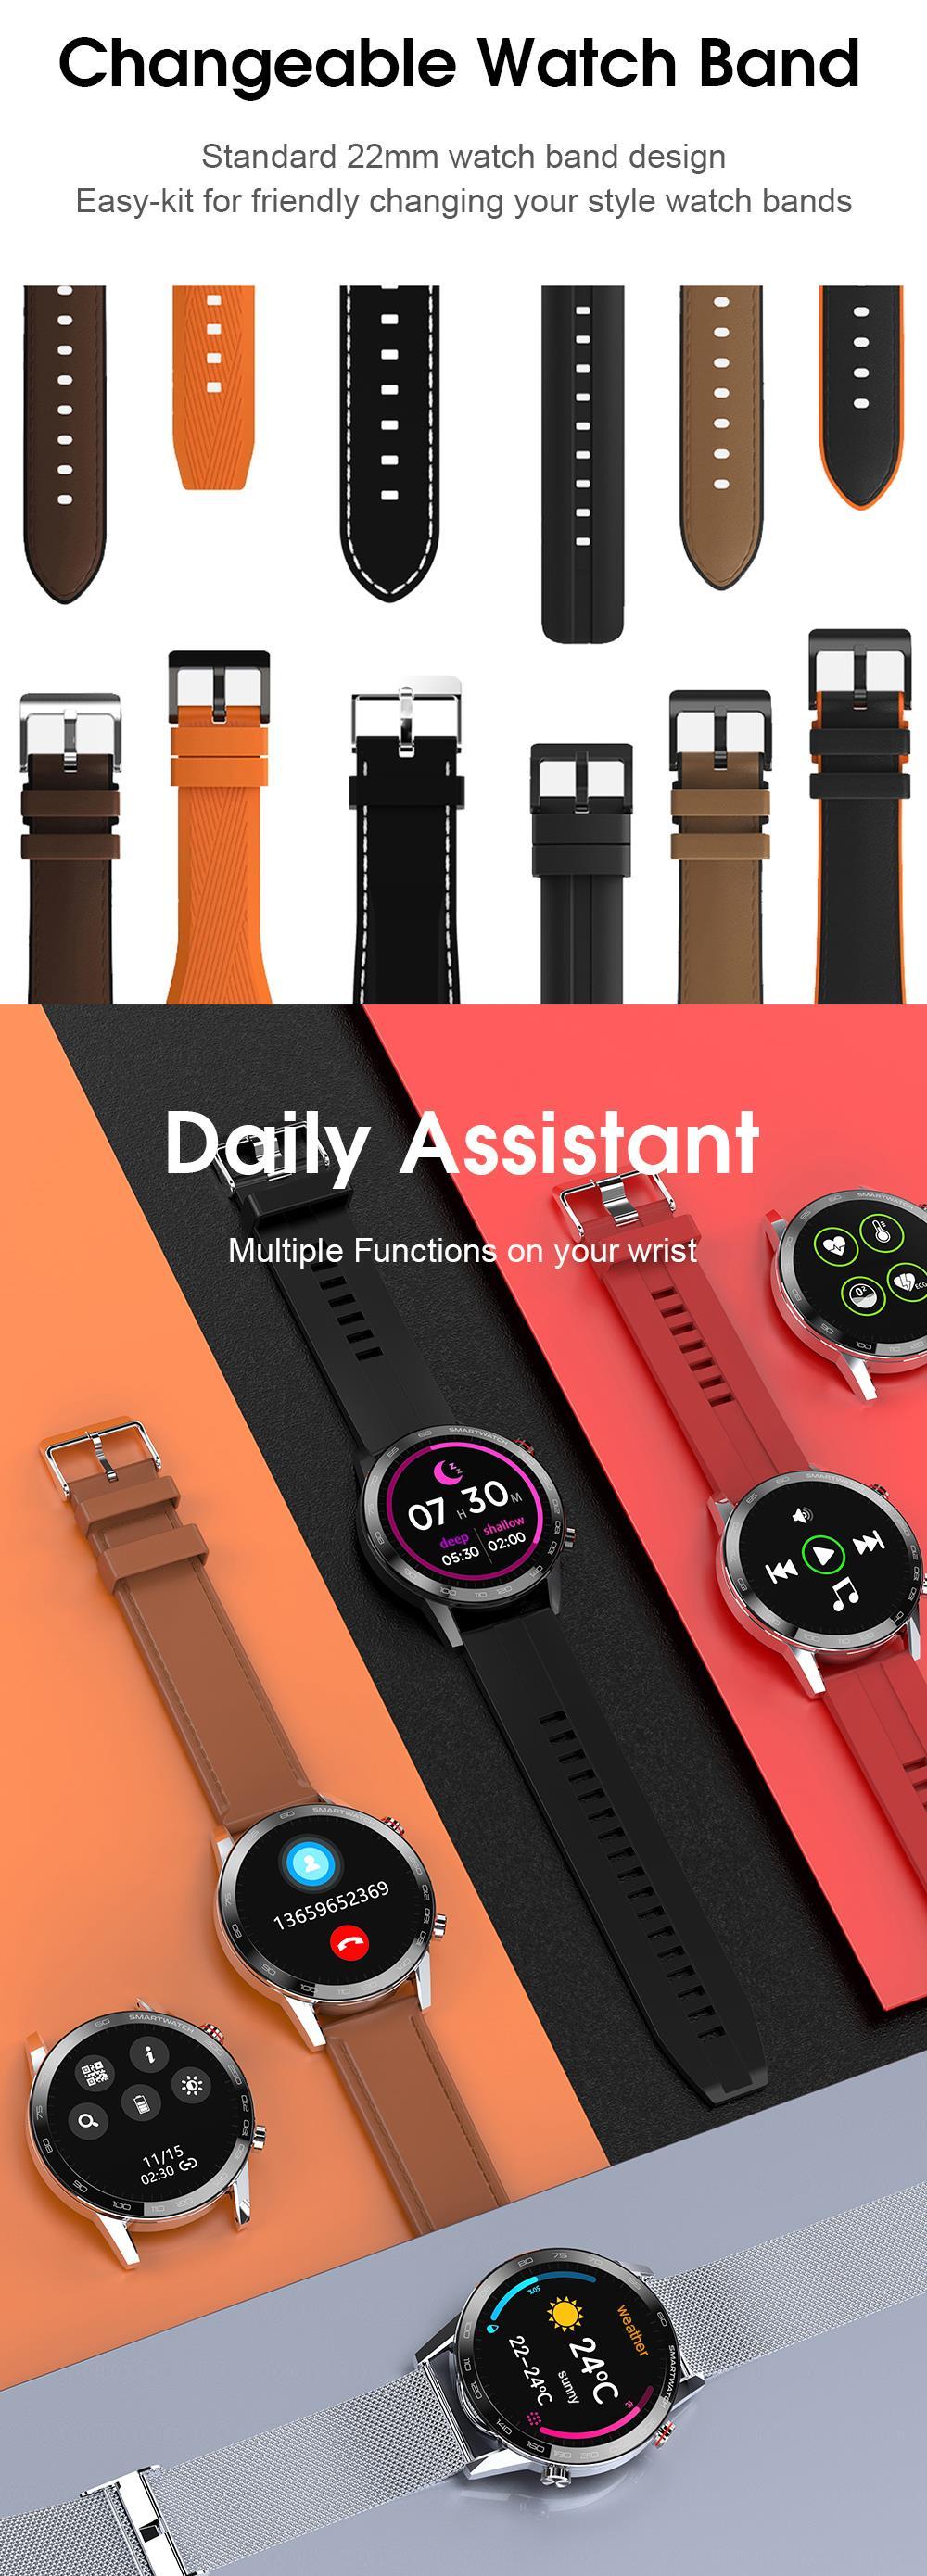 H727b1bd4fde146caa0751c7c5f5275155 Reloj Inteligente Hombre Smartwatch Ecg Ppg IP68 Smarthwatch Men Full Touch Smart Watch 2020 For Huawei Xiaomi Android Apple IOS